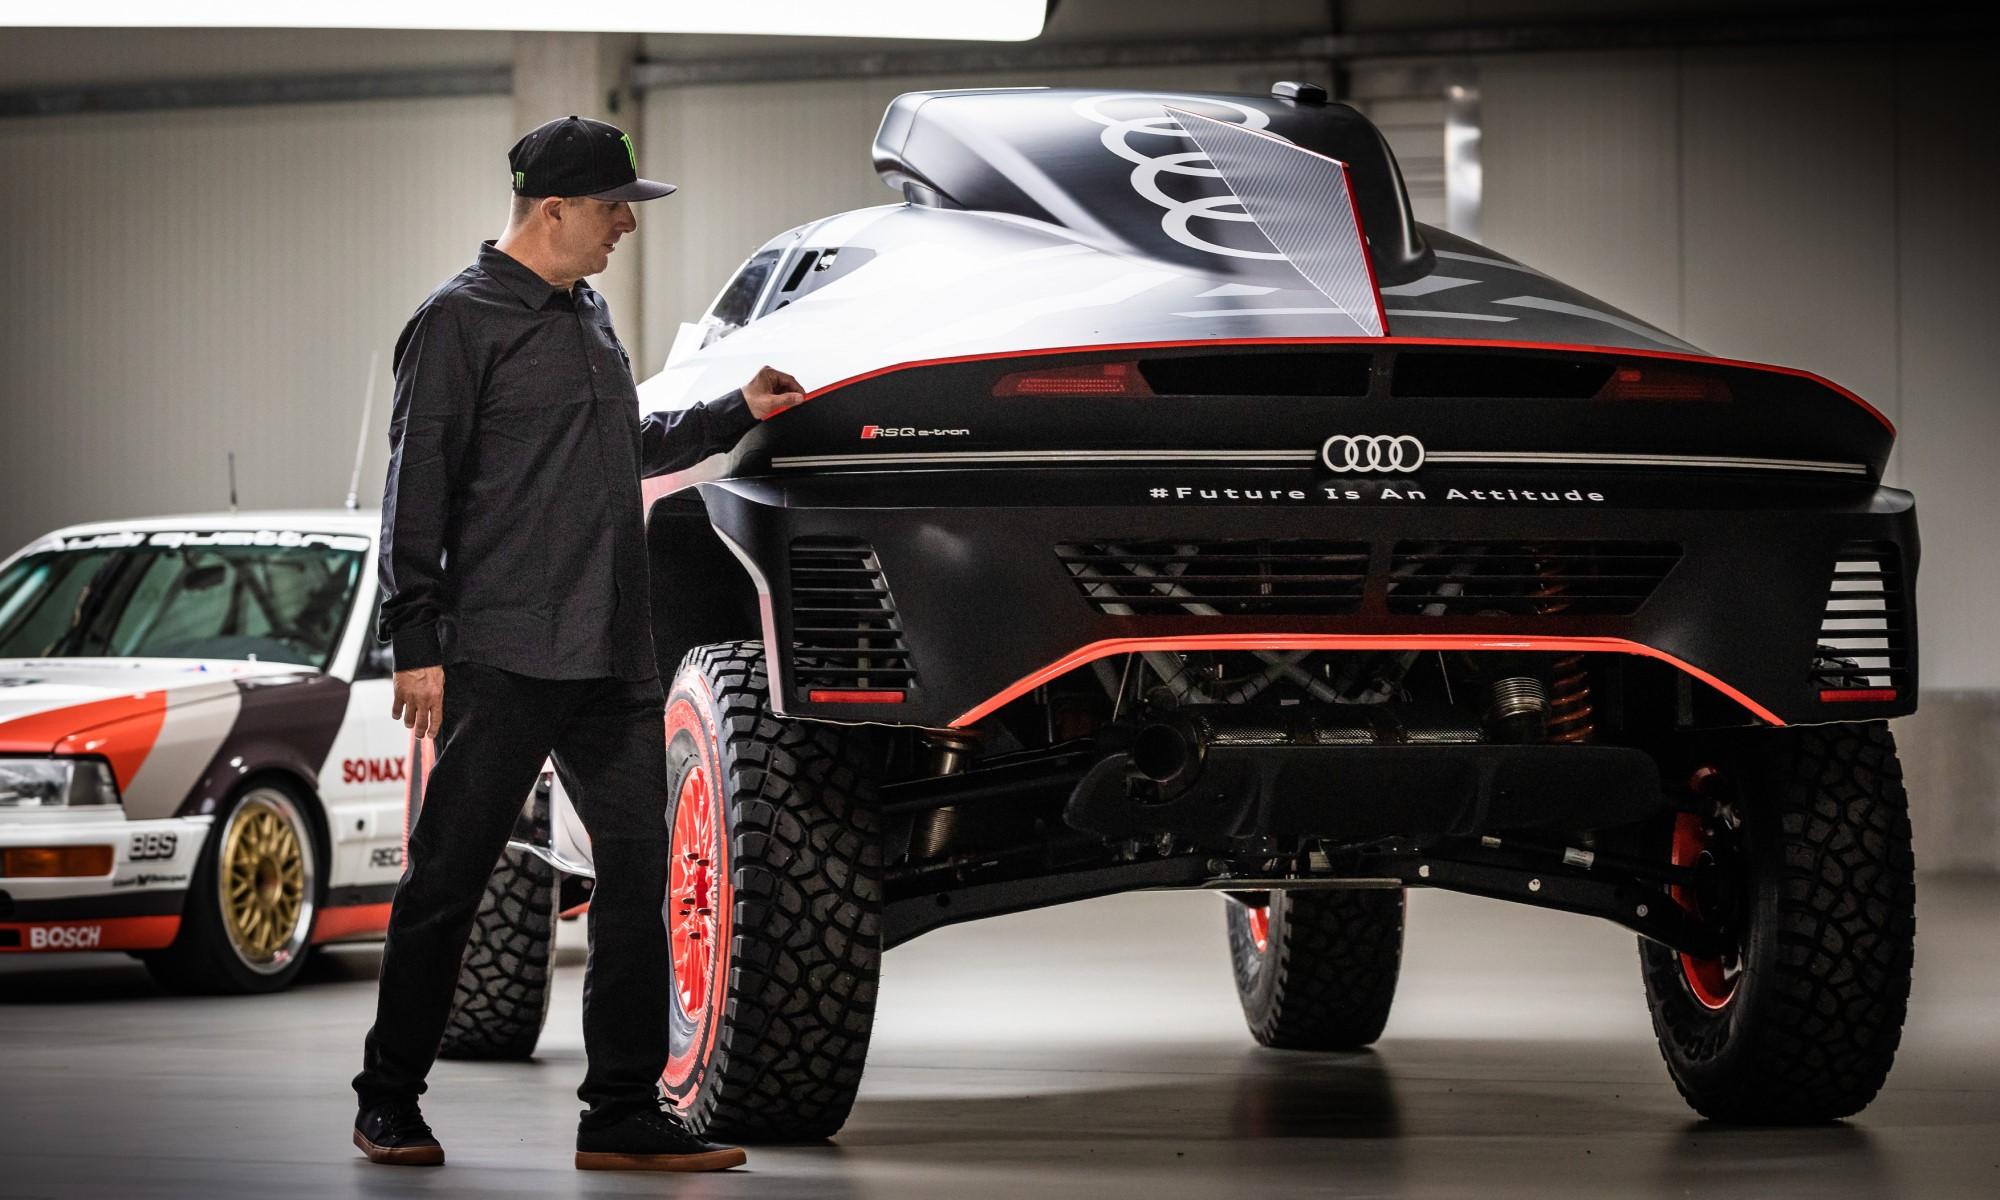 Ken Block joins Audi